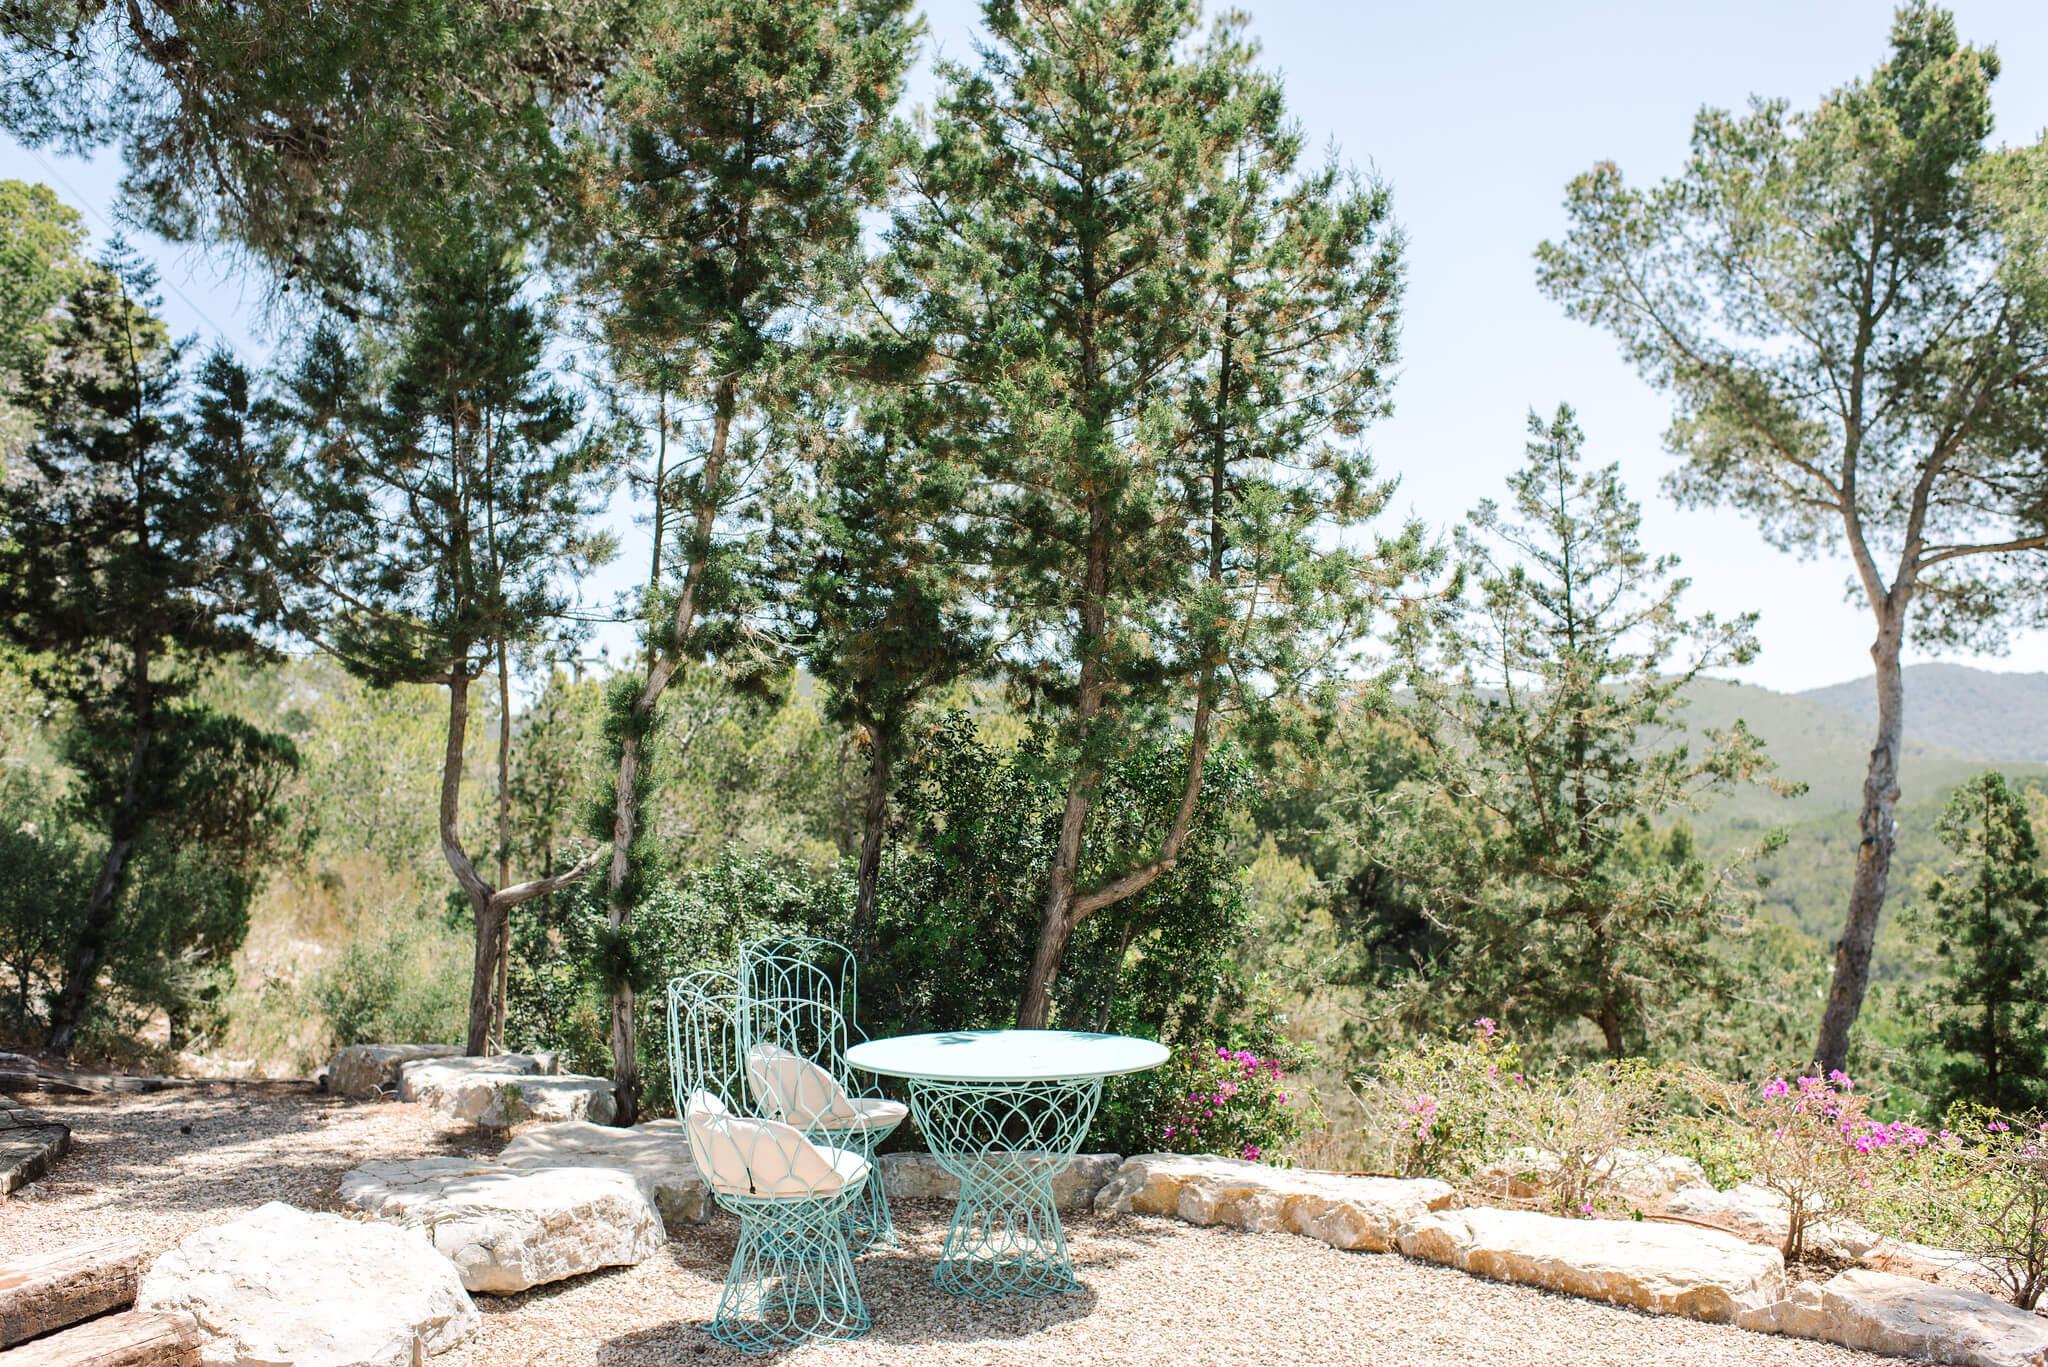 https://www.white-ibiza.com/wp-content/uploads/2020/06/white-ibiza-villas-can-jondal-exterior-terrace.jpg